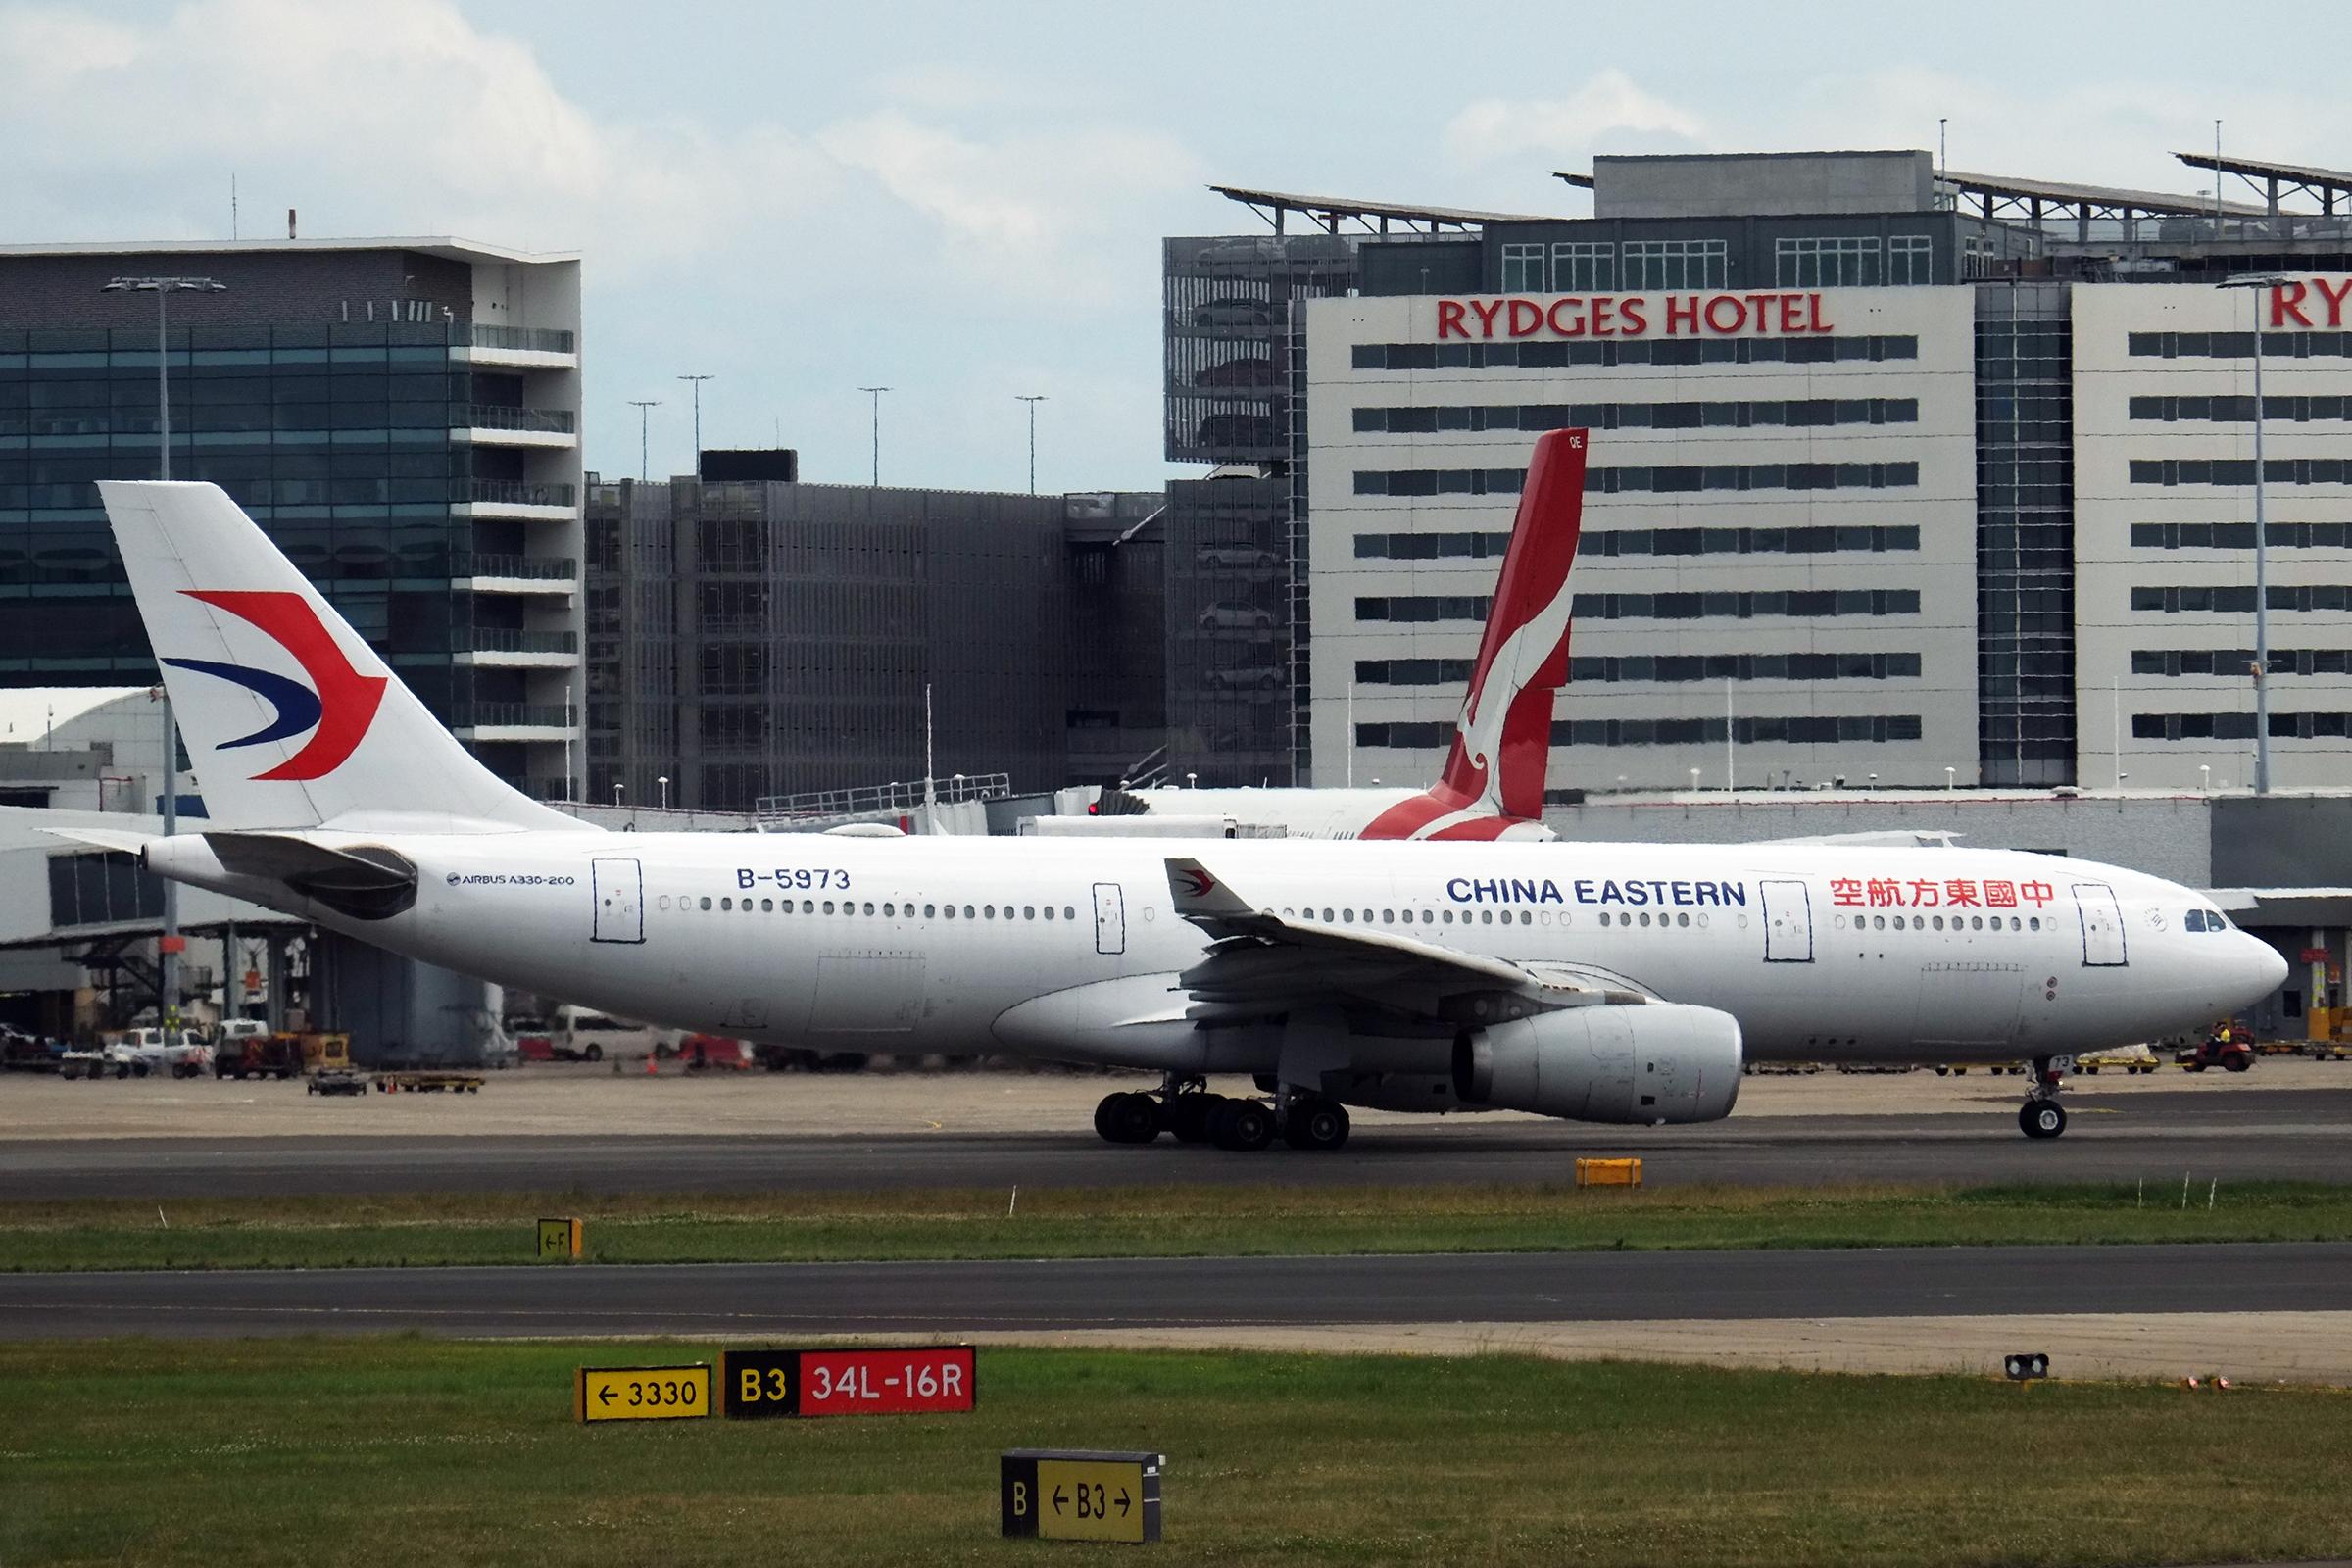 Qantas, China Eastern partnership extended to 2023